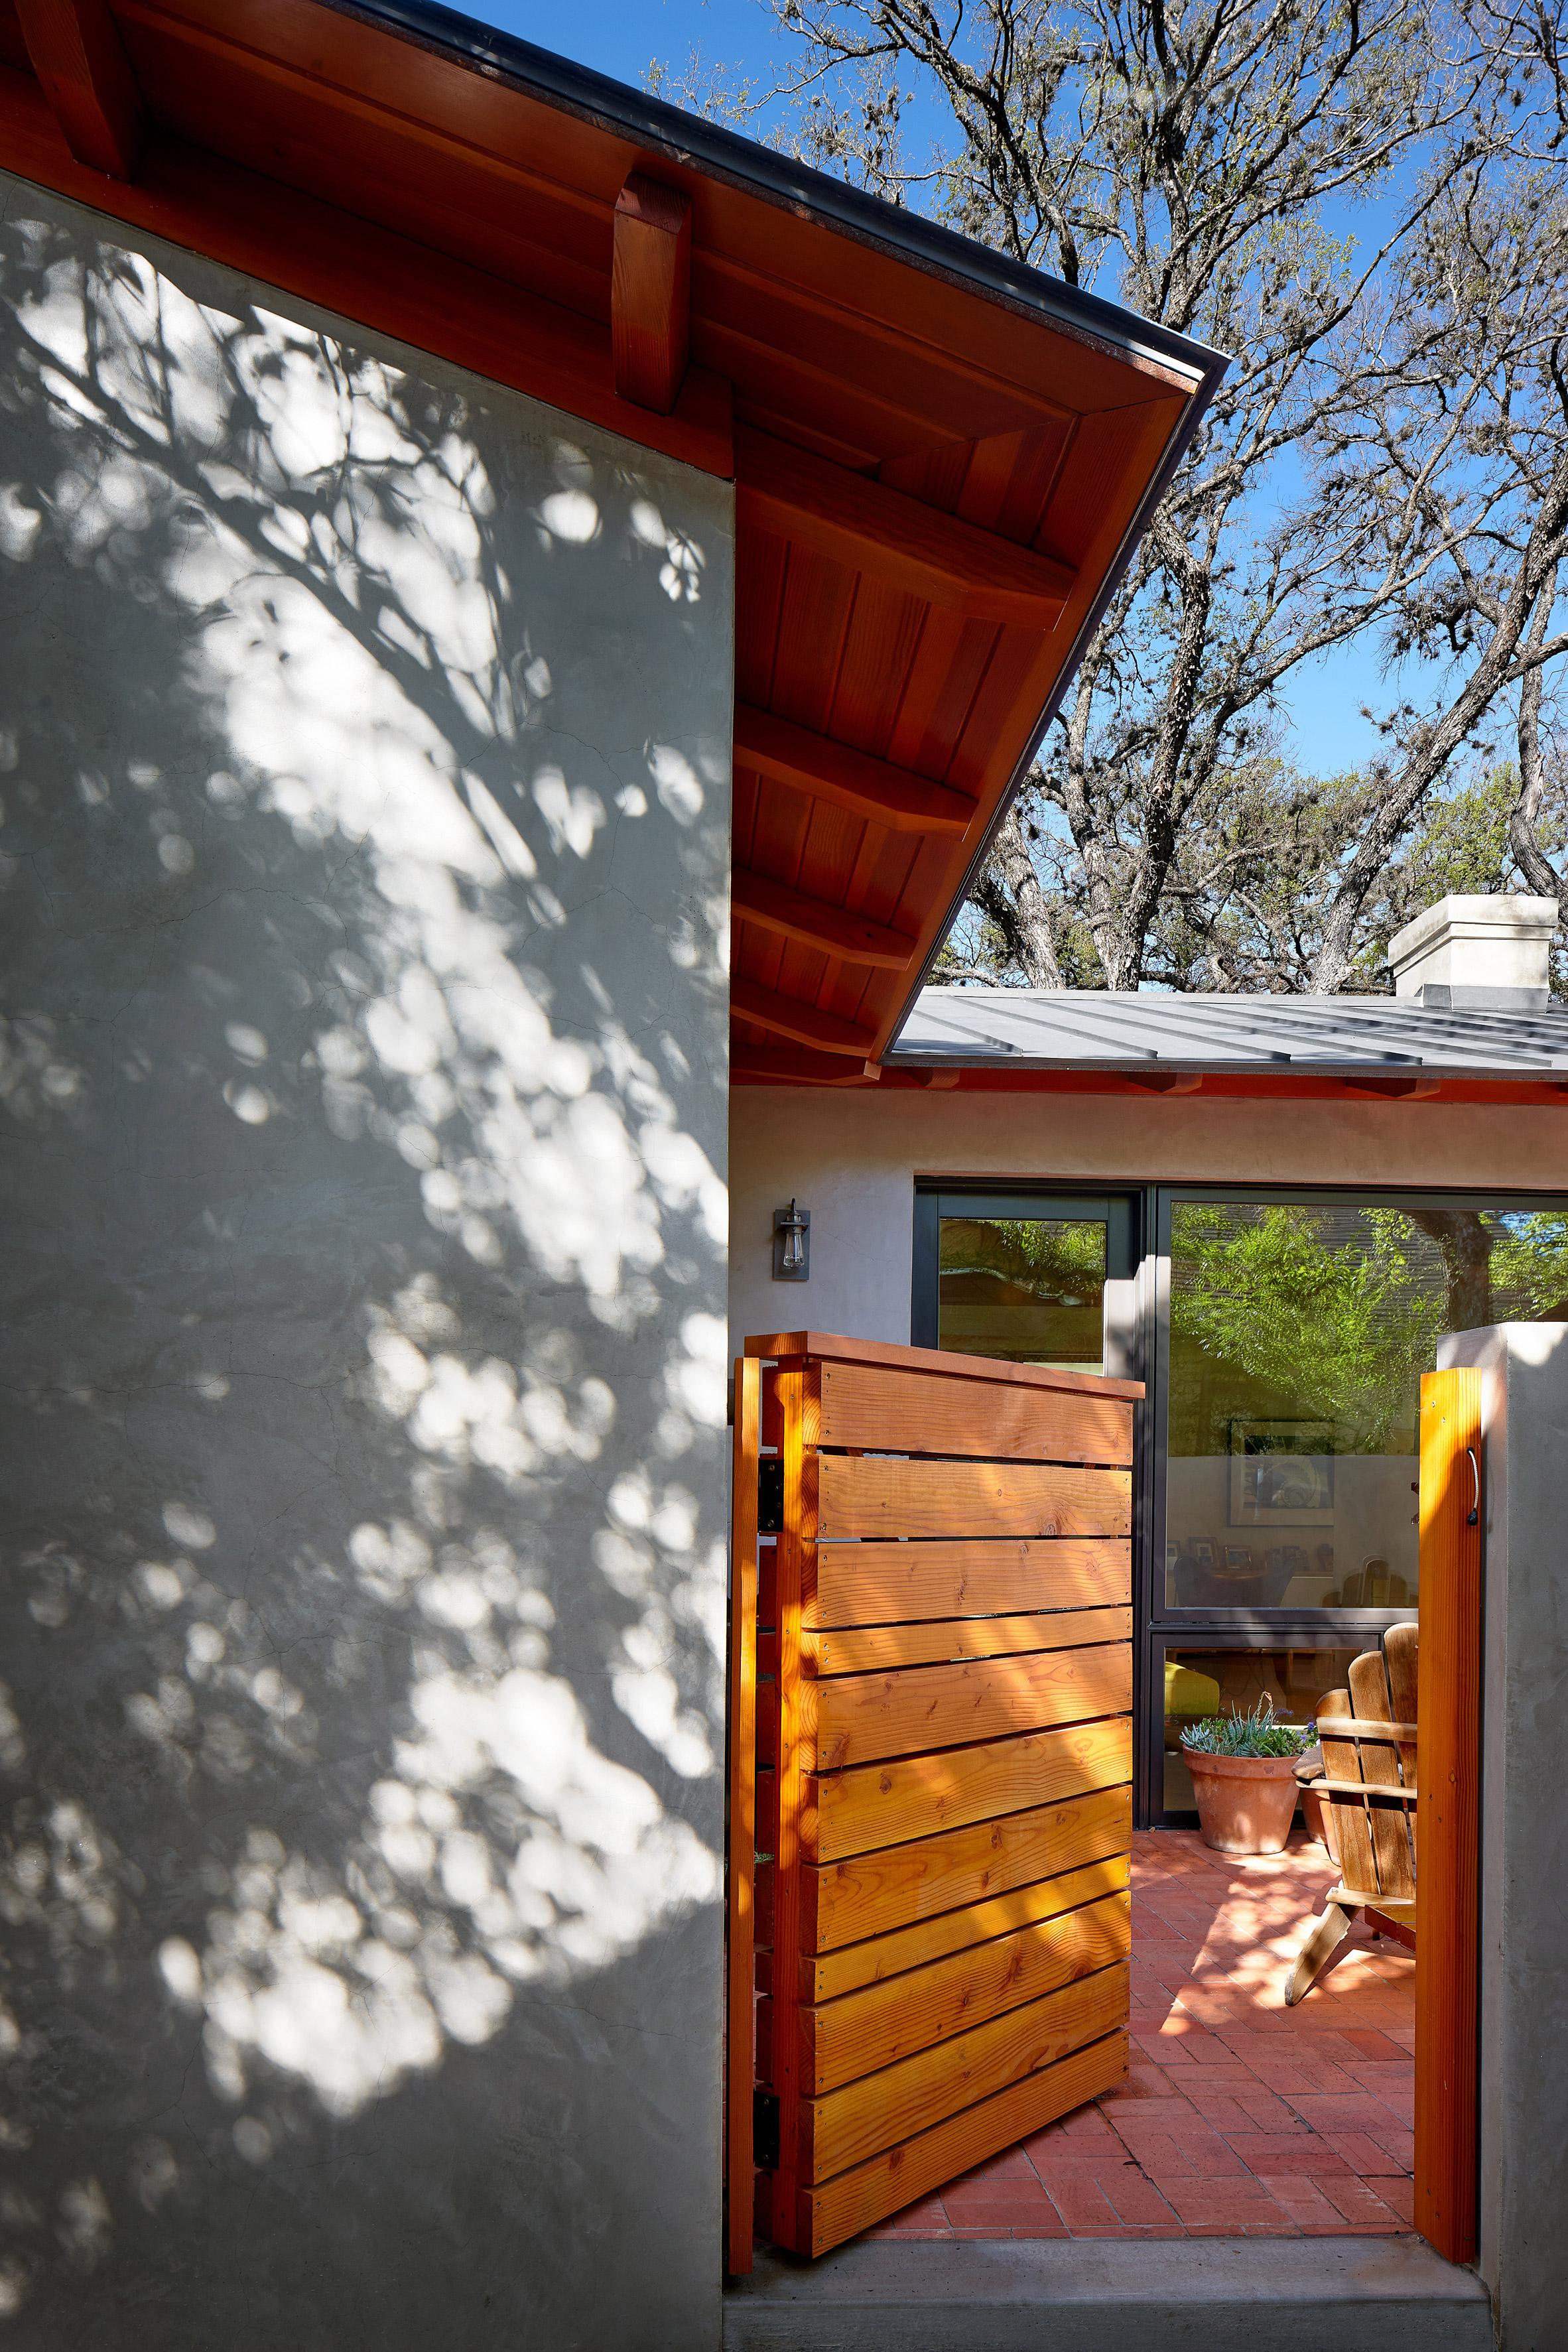 Craig McMahon renovates concrete bungalow in San Antonio for his family